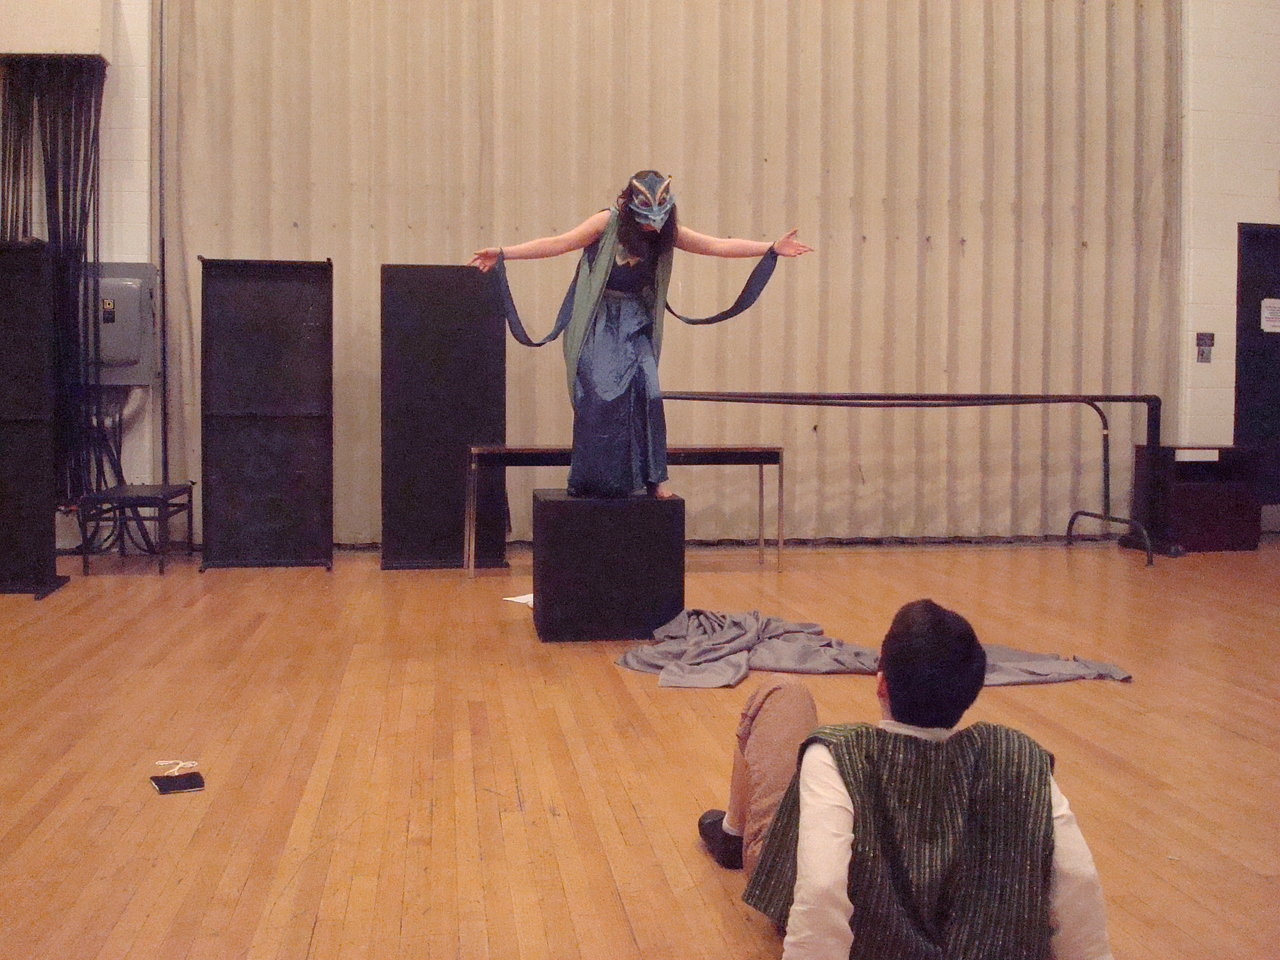 Dragon in rehearsal